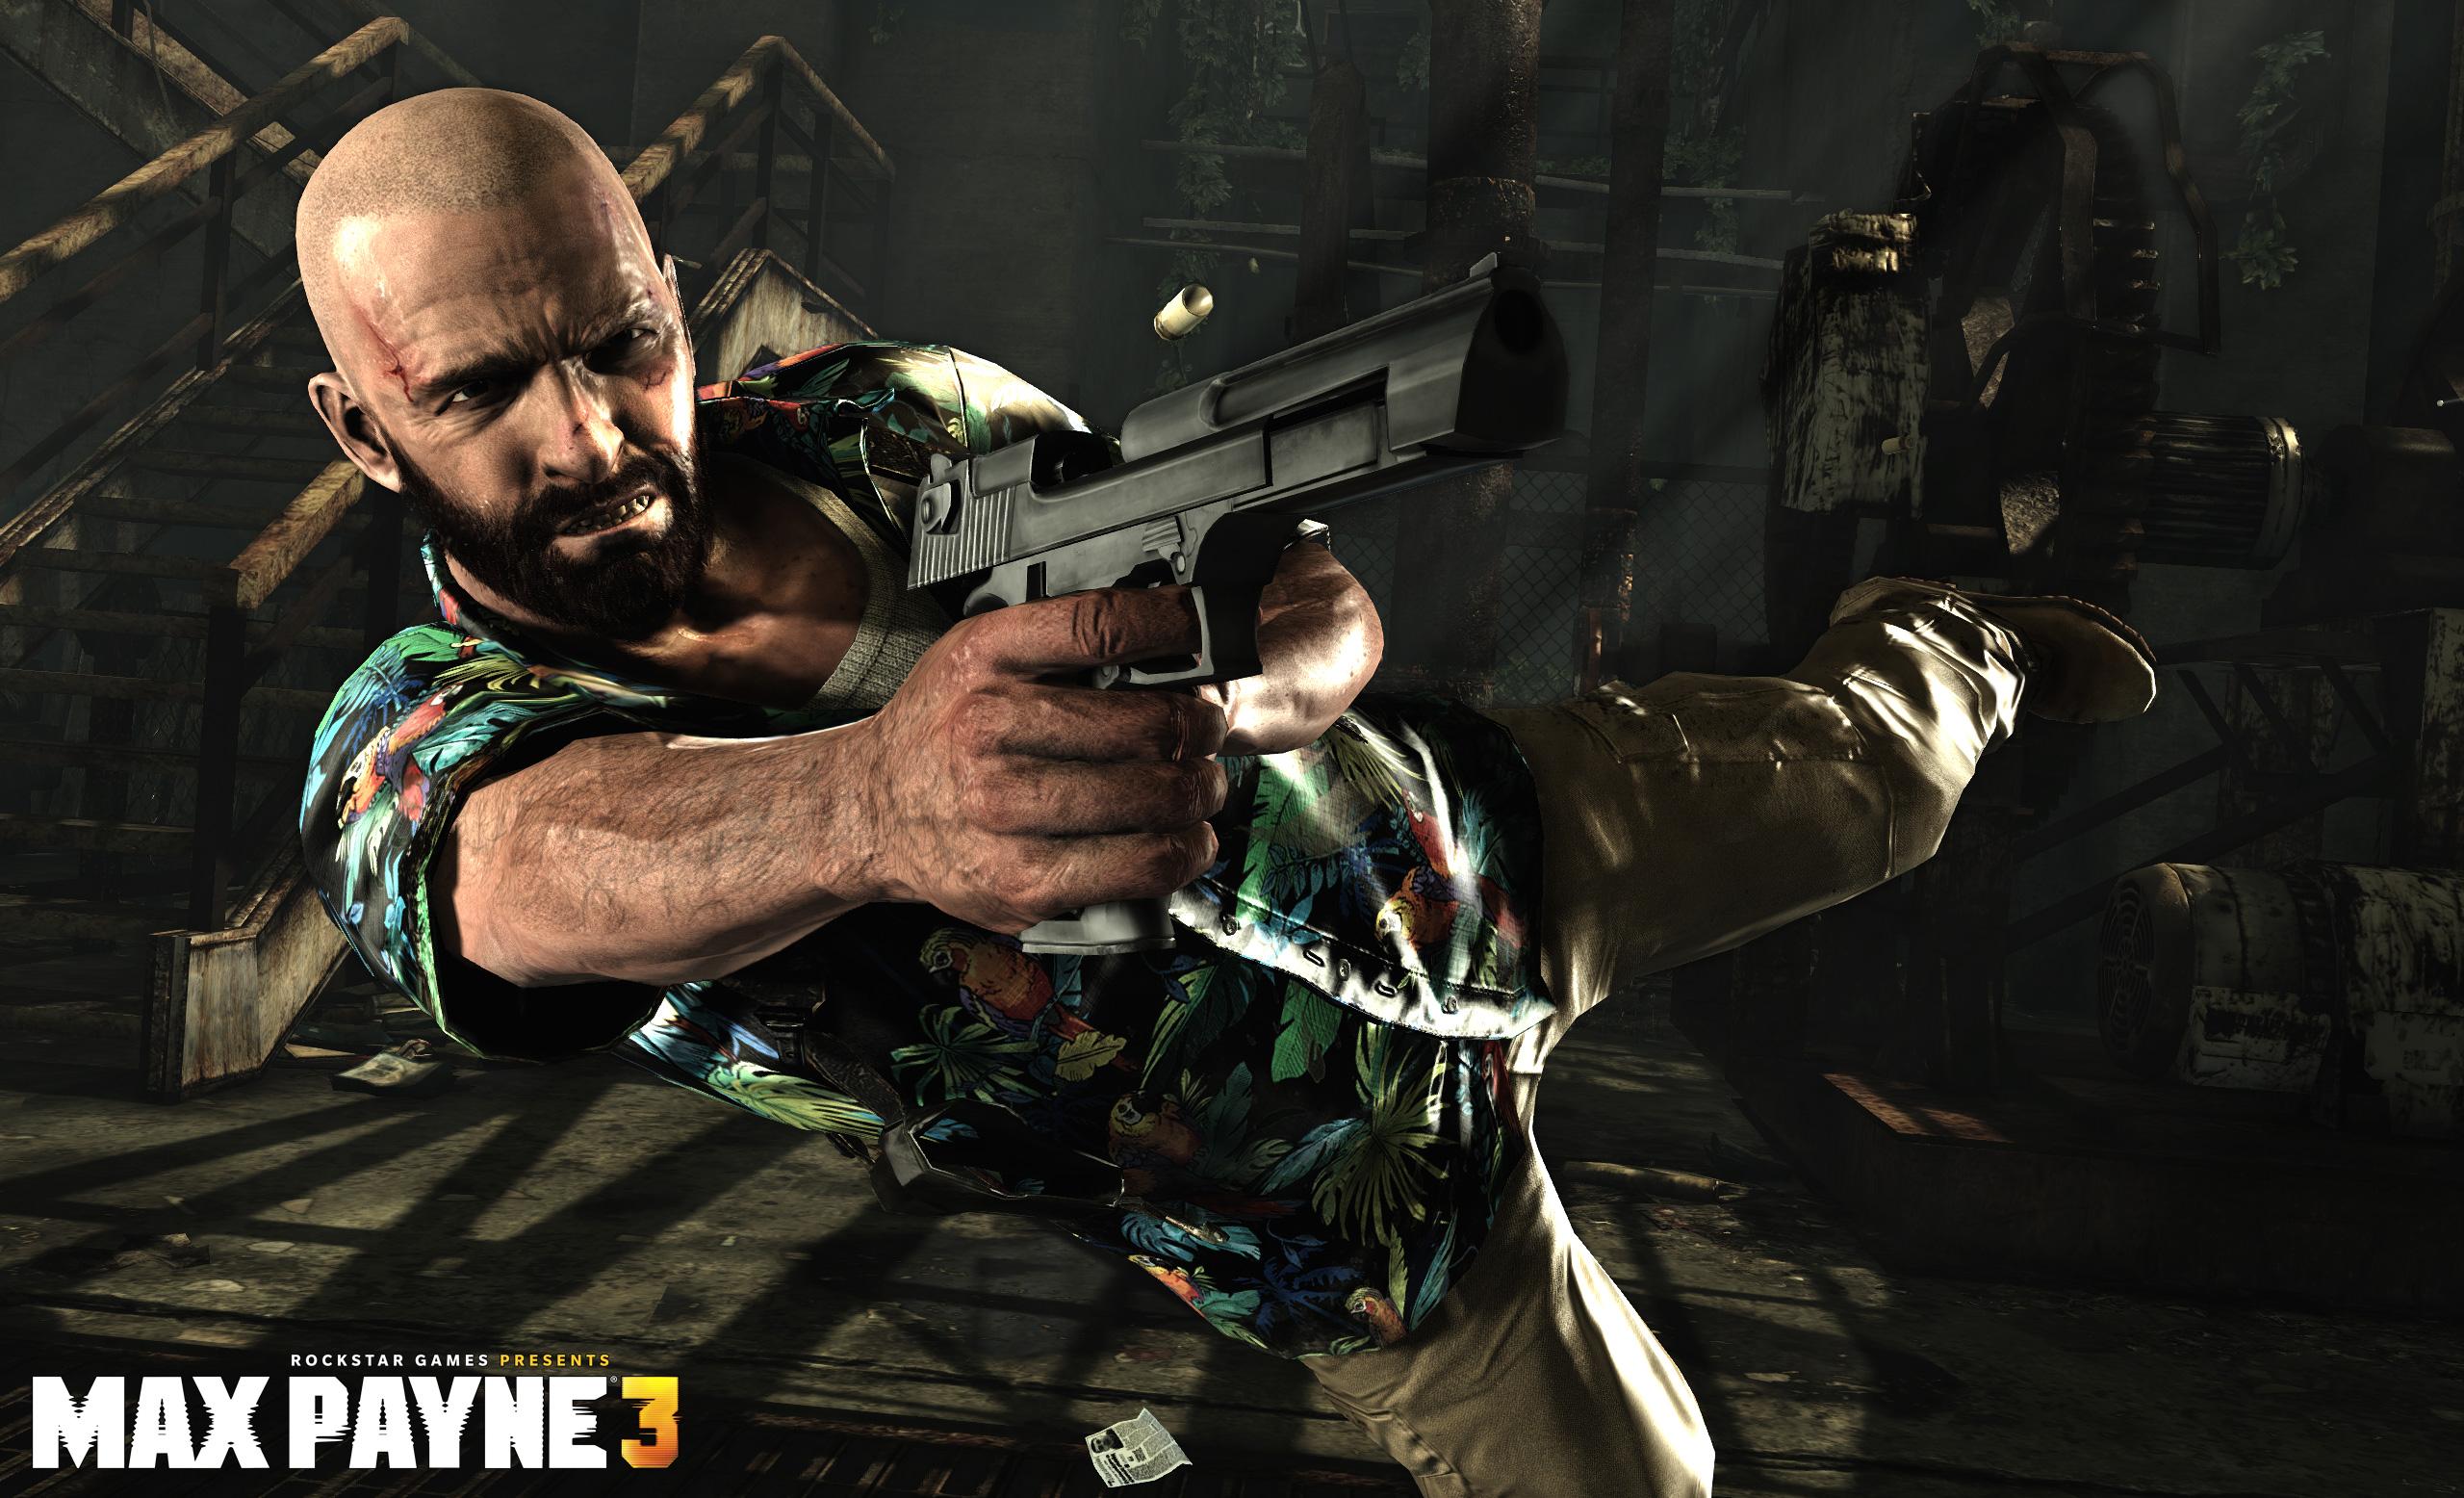 Max Payne 3: русская озвучка